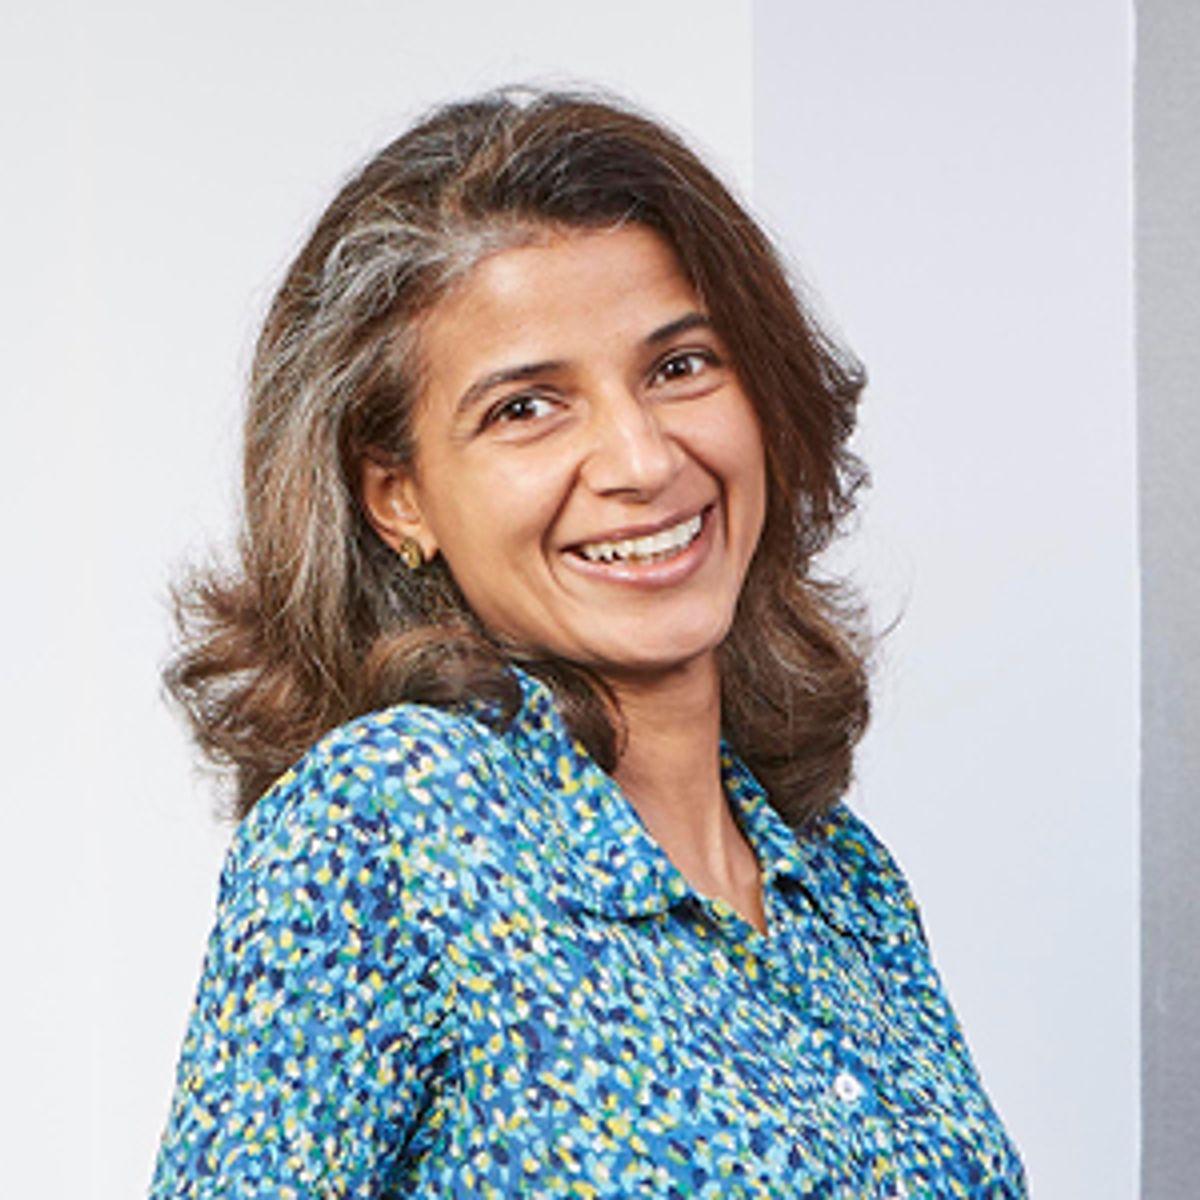 Nidhi Mukhuty